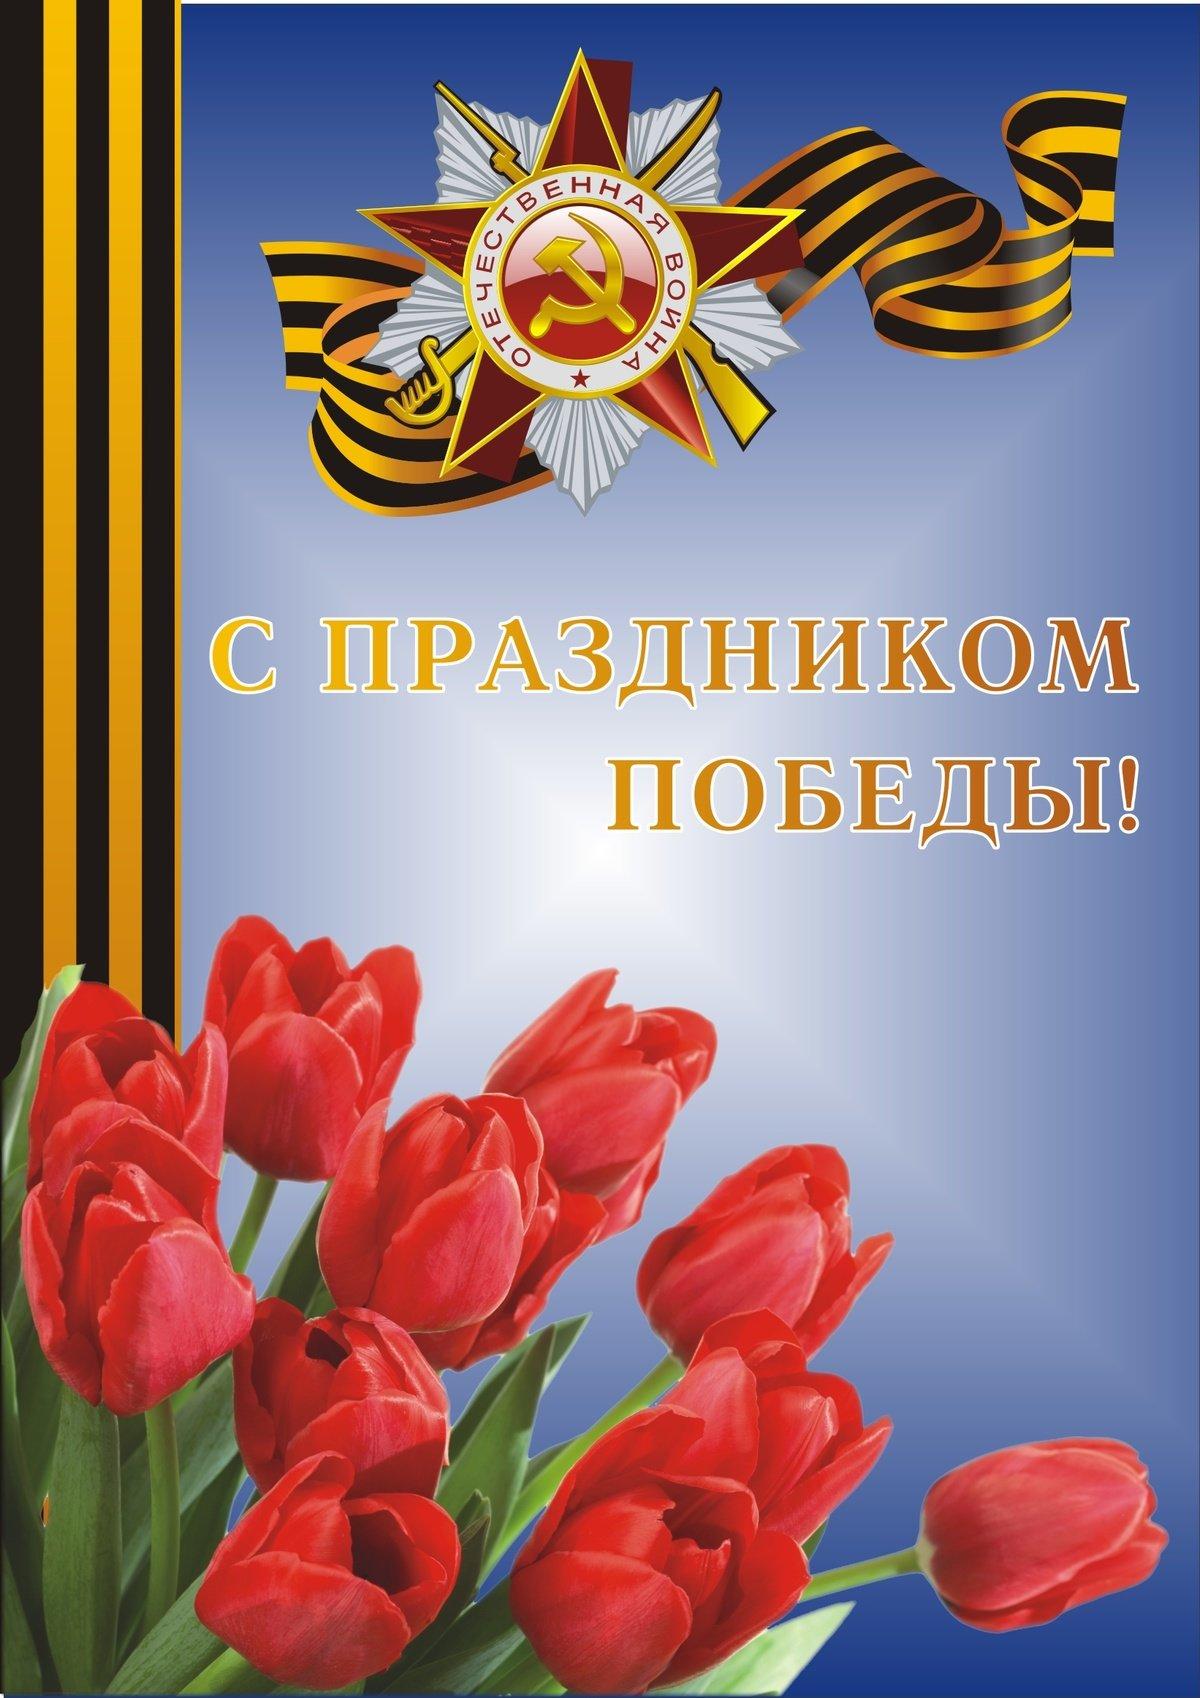 Картинки к 9 мая на открытку, танечке добрым